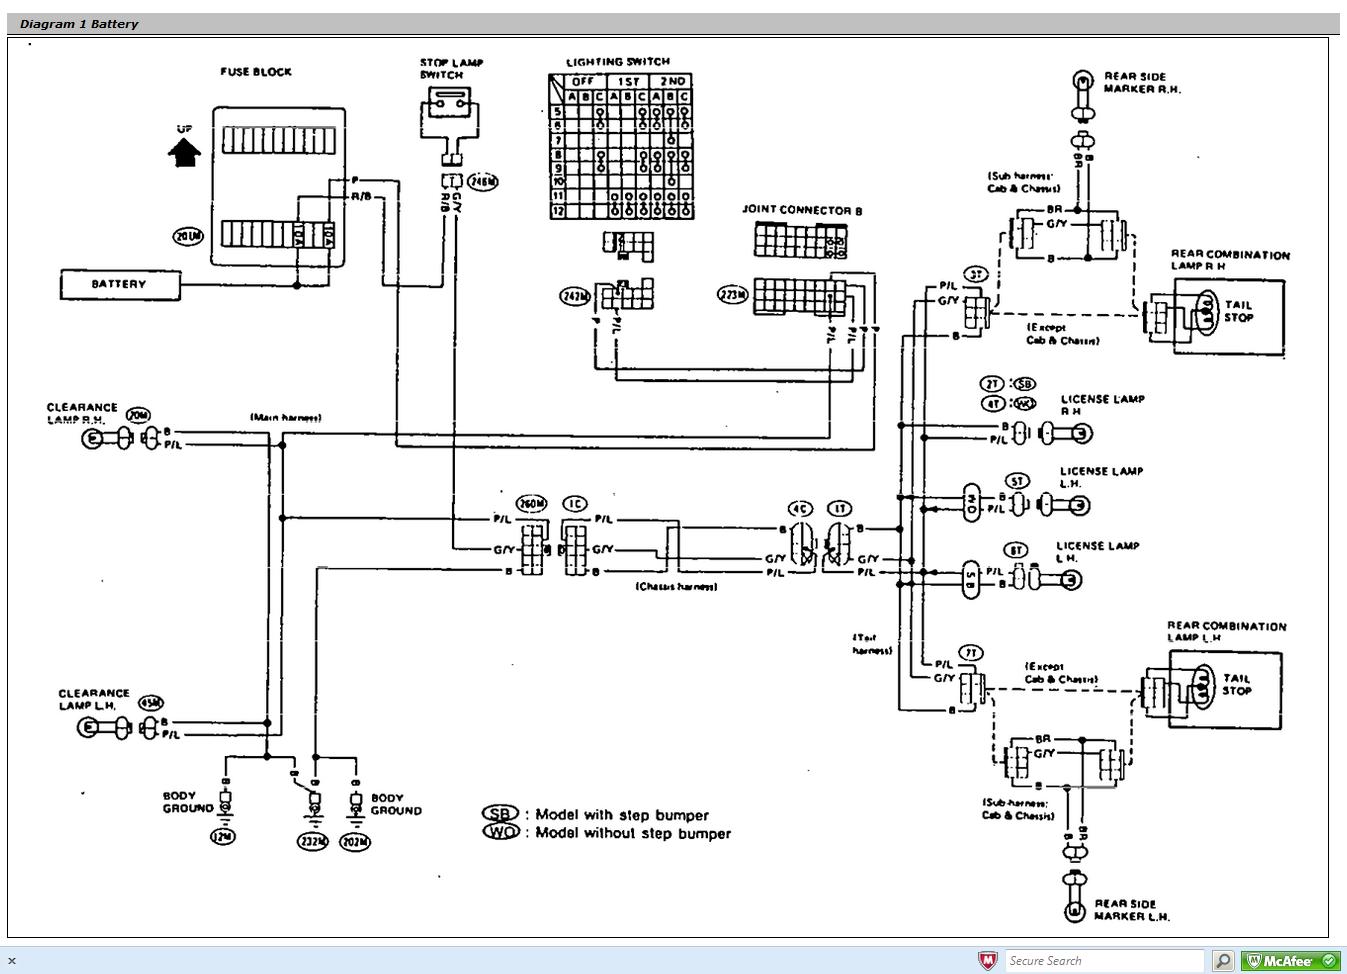 1991 Nissan D2 Truck Wiring Wiring Diagram Level Level Lionsclubviterbo It